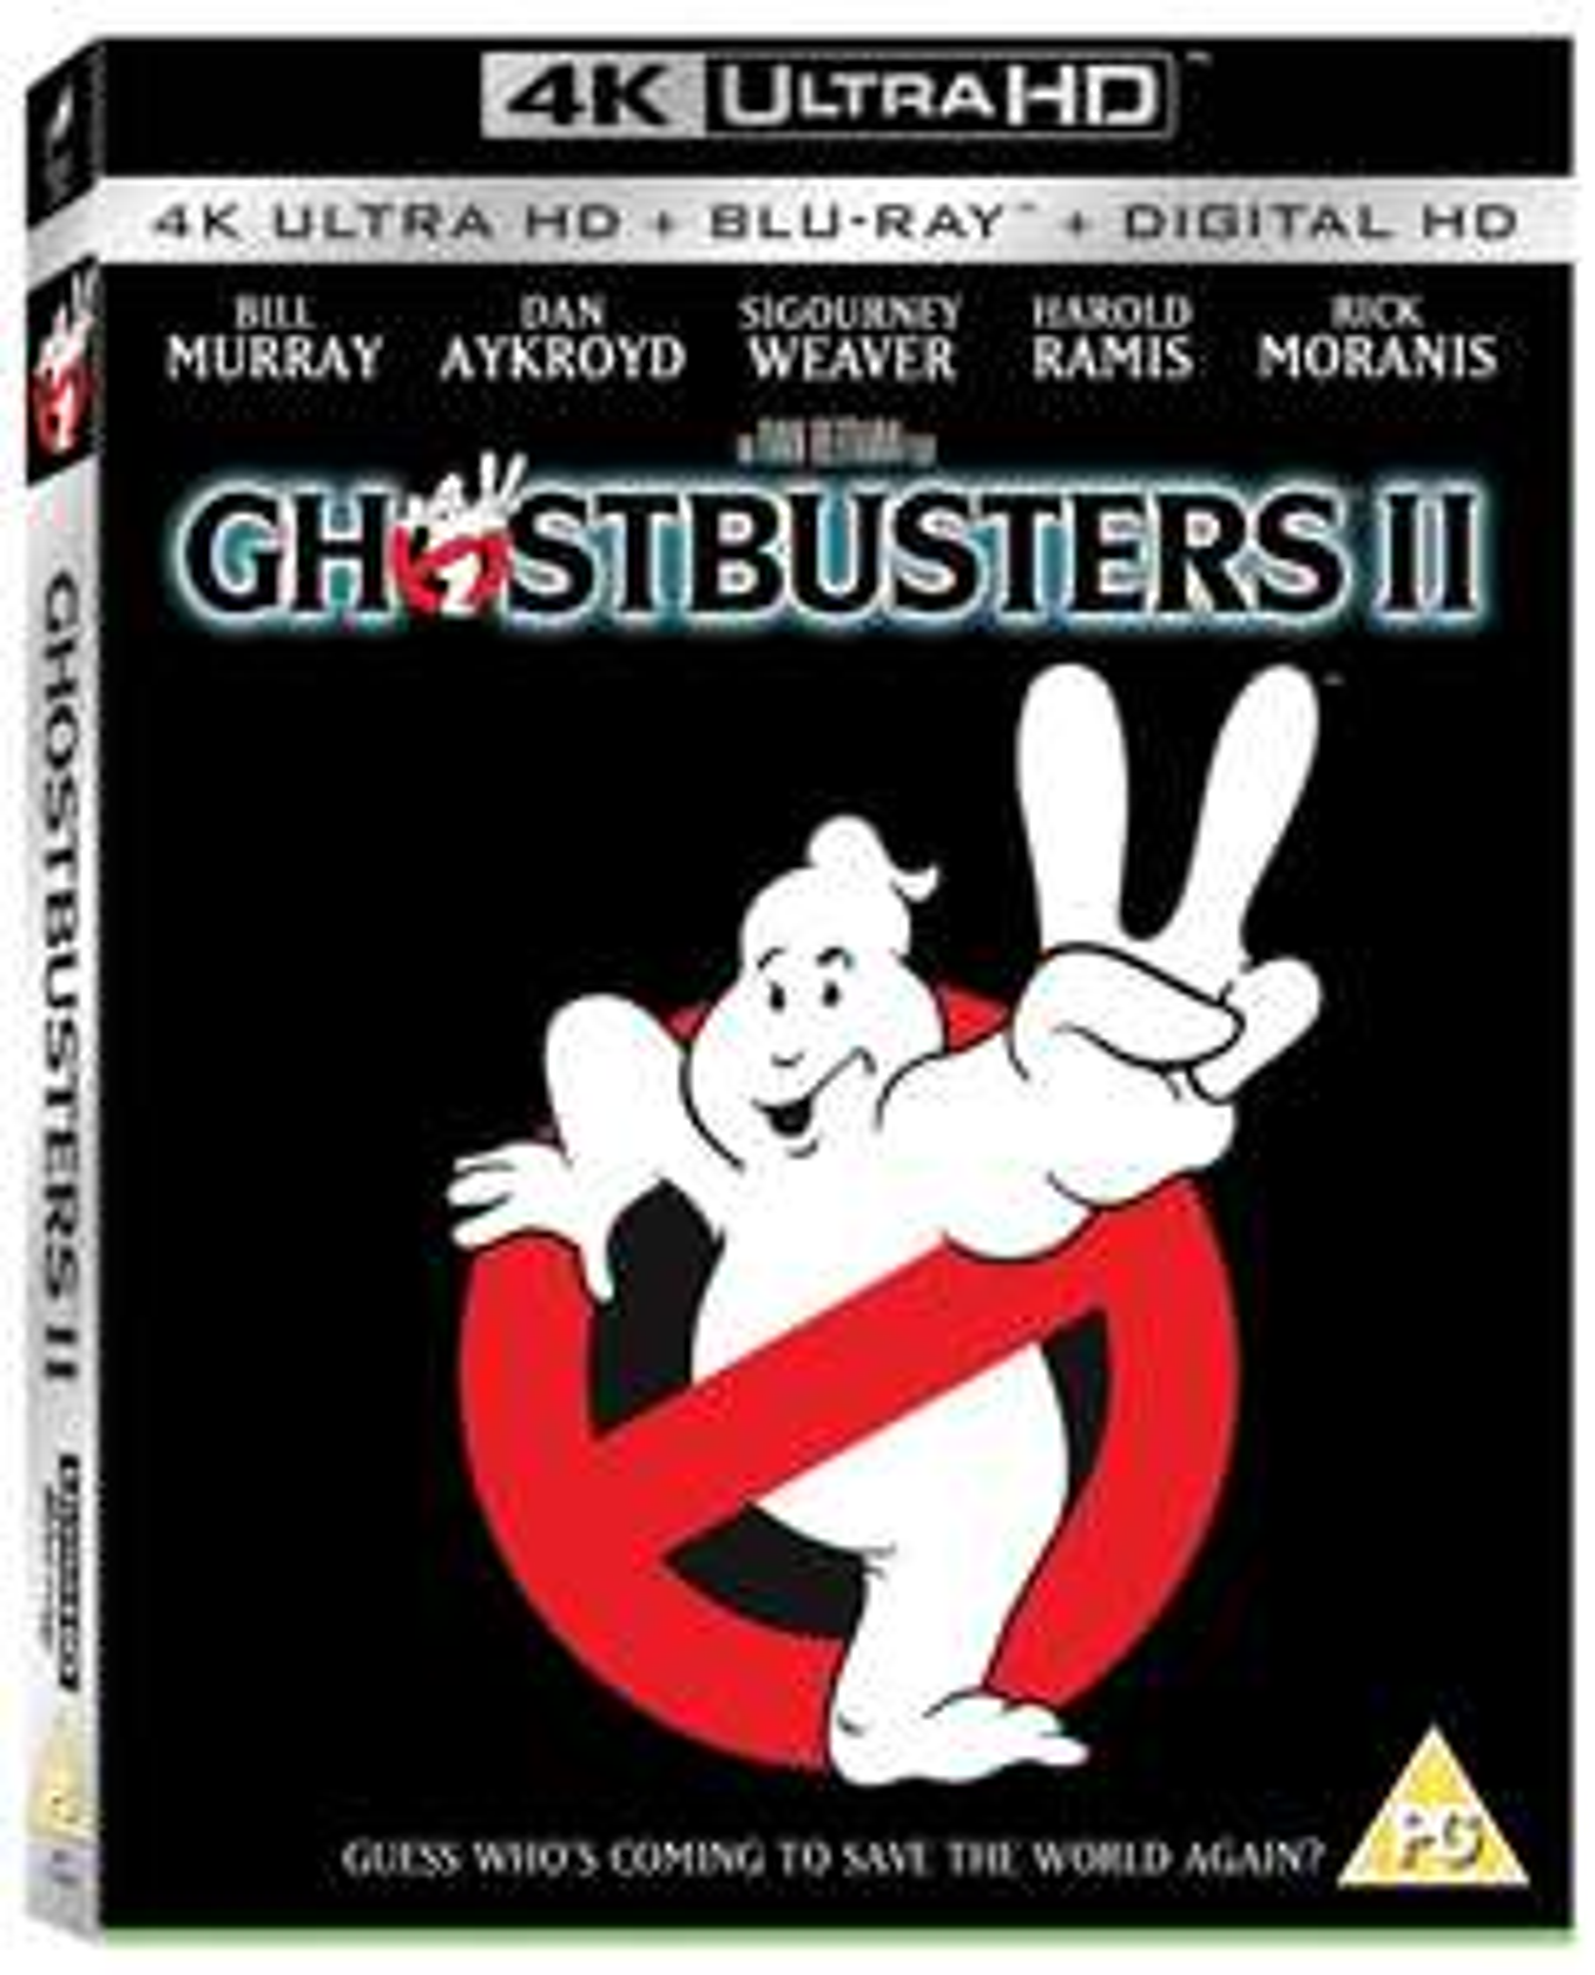 Ghostbusters 2 4k UHD Blu Ray - £6.99 @ HMV